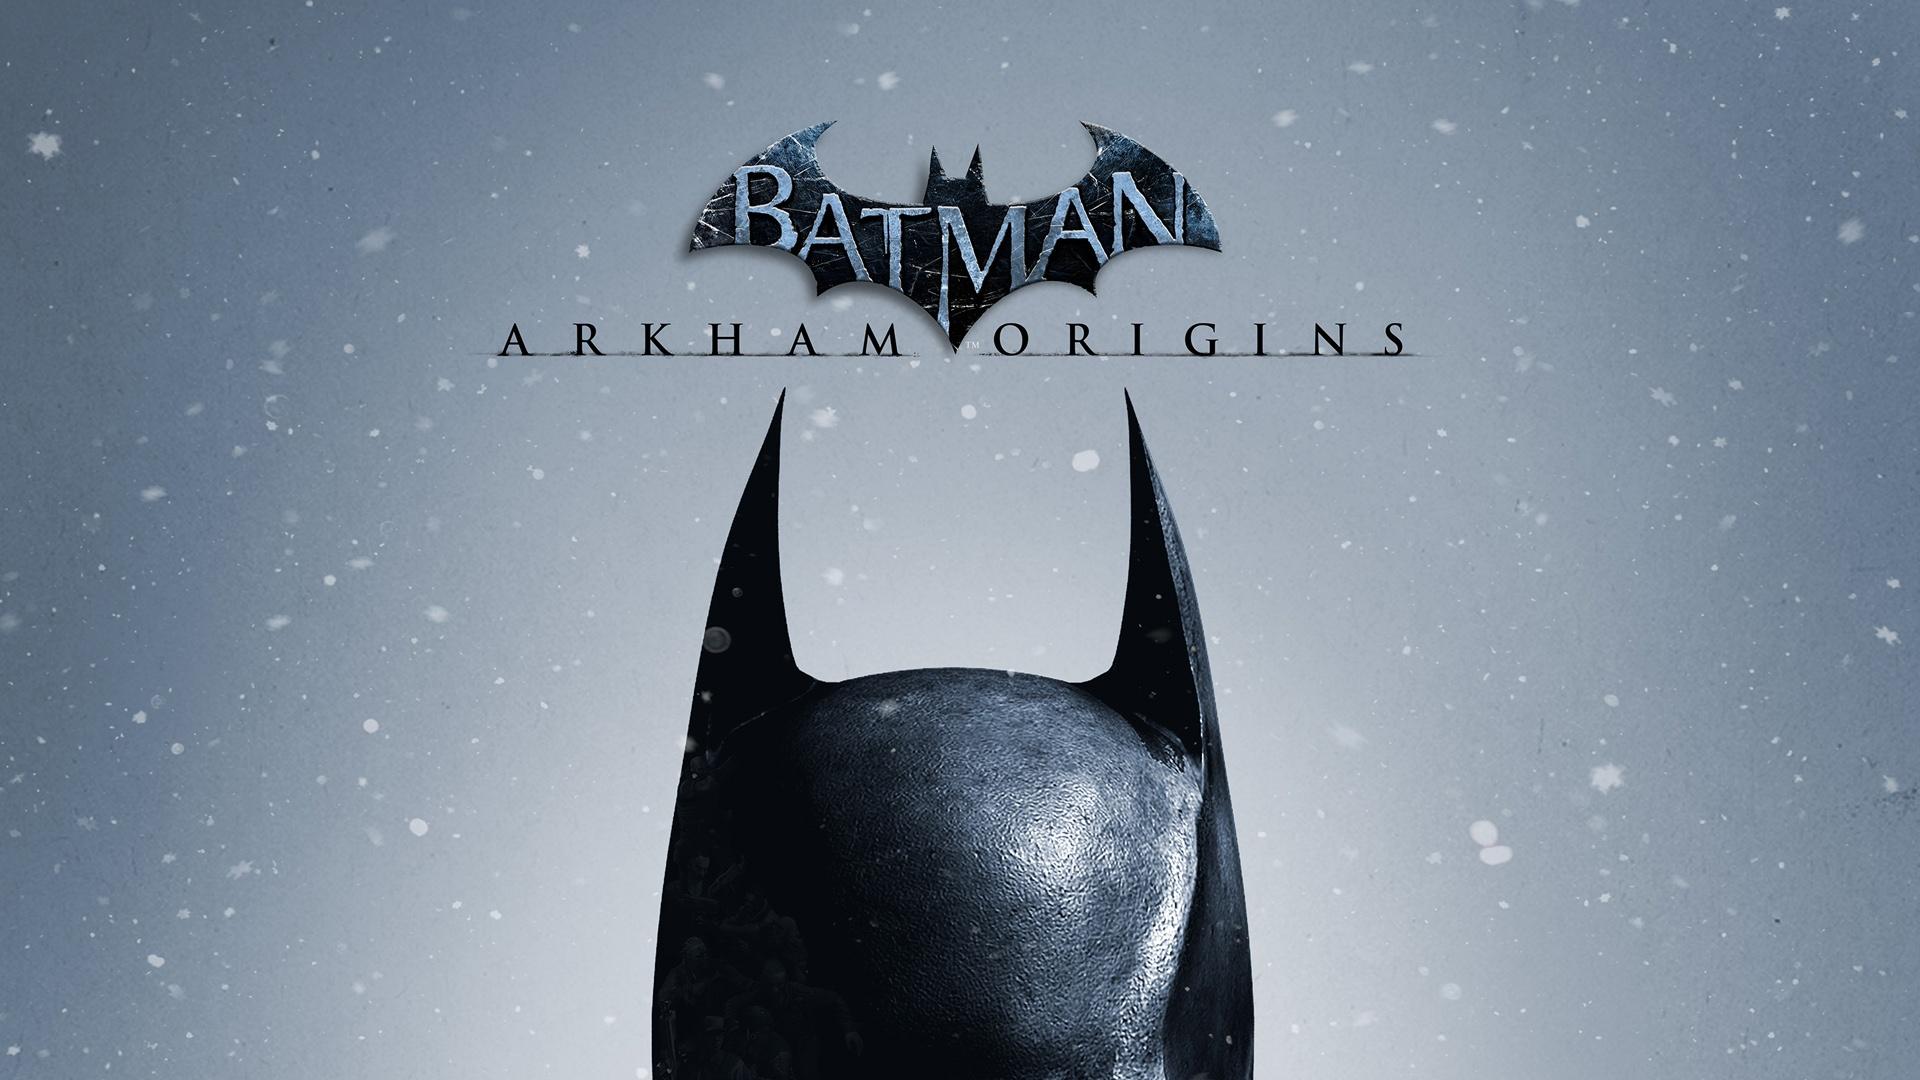 Batman arkham origins wallpapers in jpg format for free download batman arkham origins wallpapers voltagebd Images